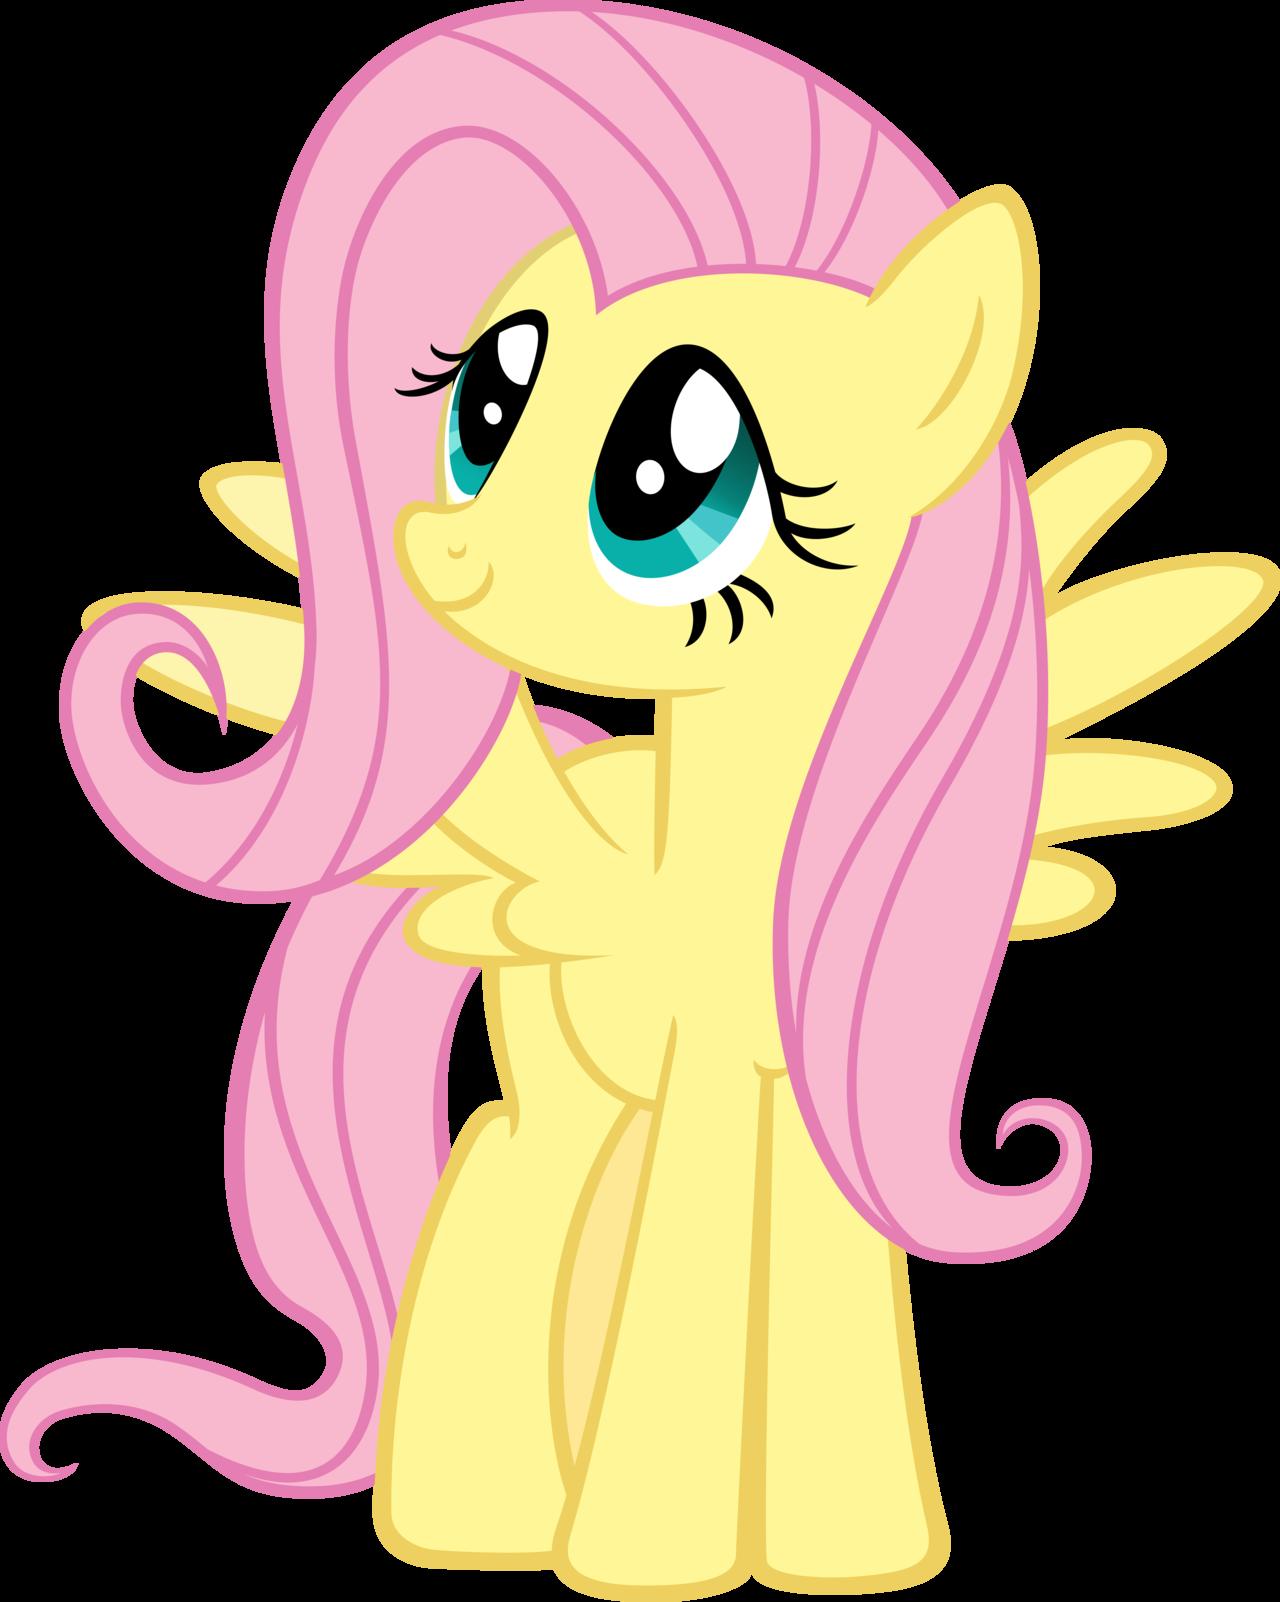 Fluttershy (My Little Pony: Friendship is Magic) (1280×1602)